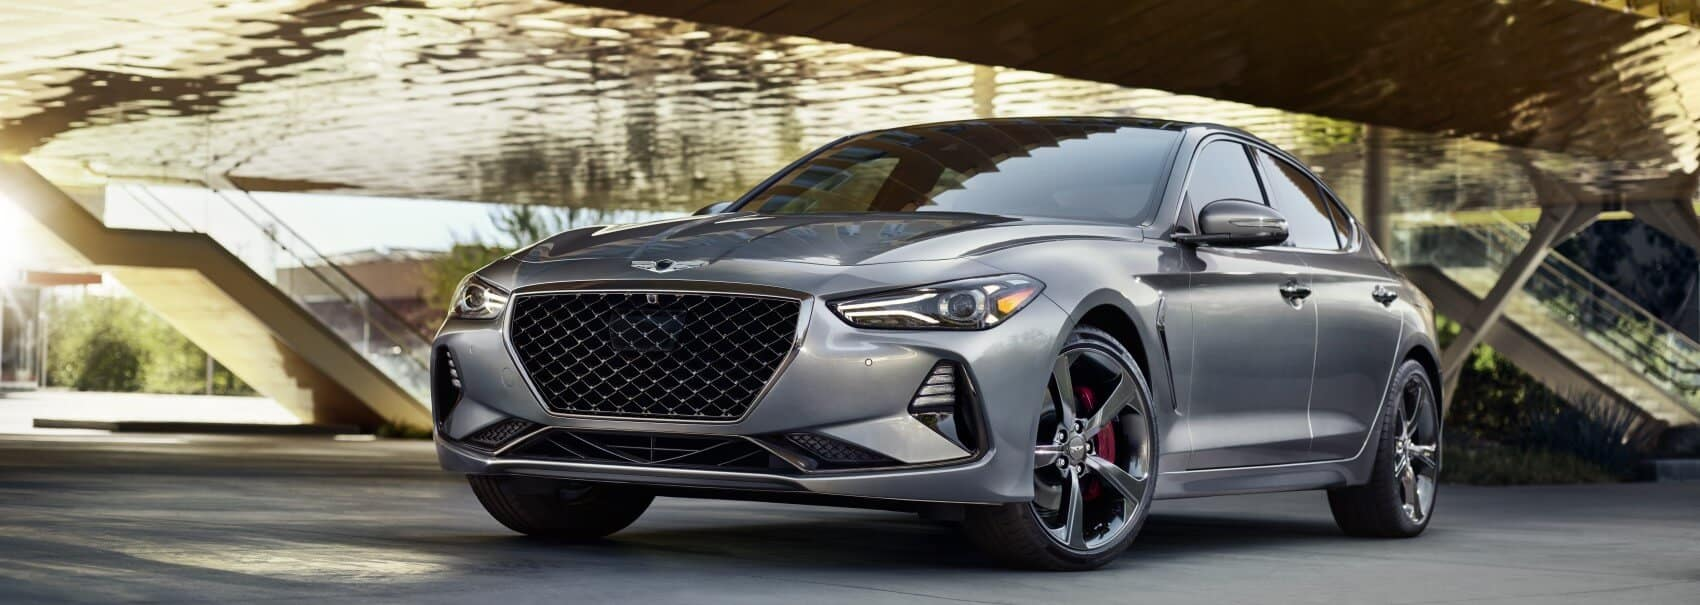 Genesis G70 vs Acura TLX